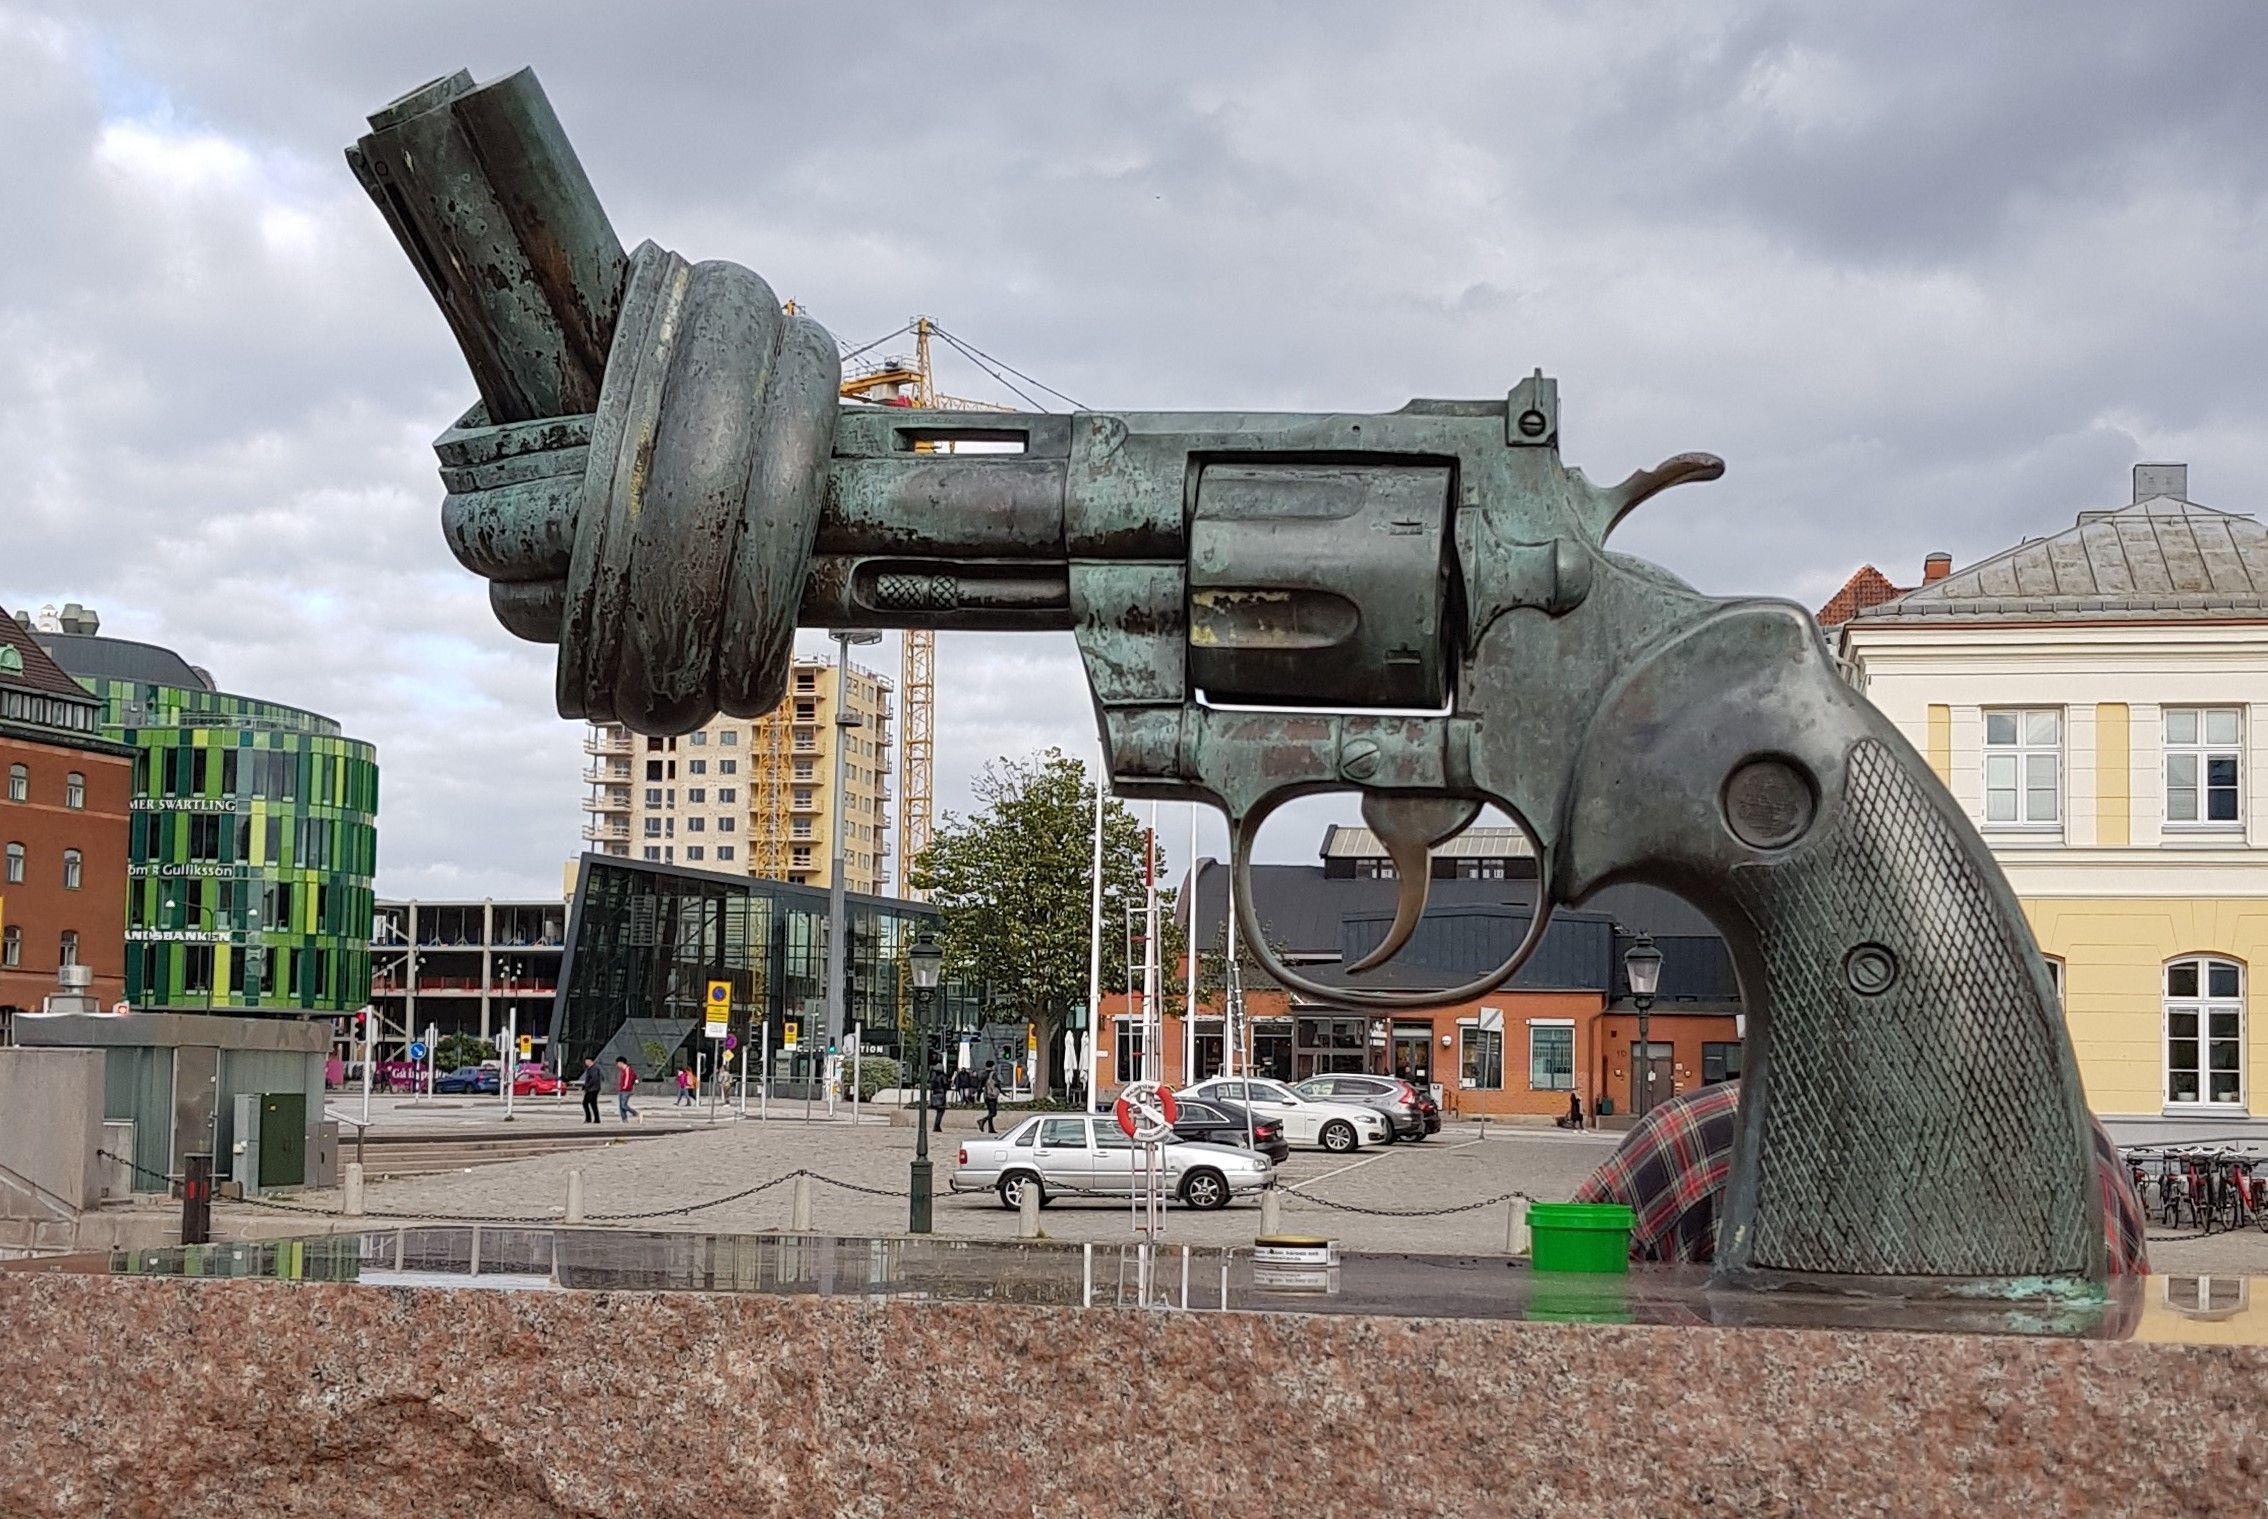 Escultura de pistola con un nudo.